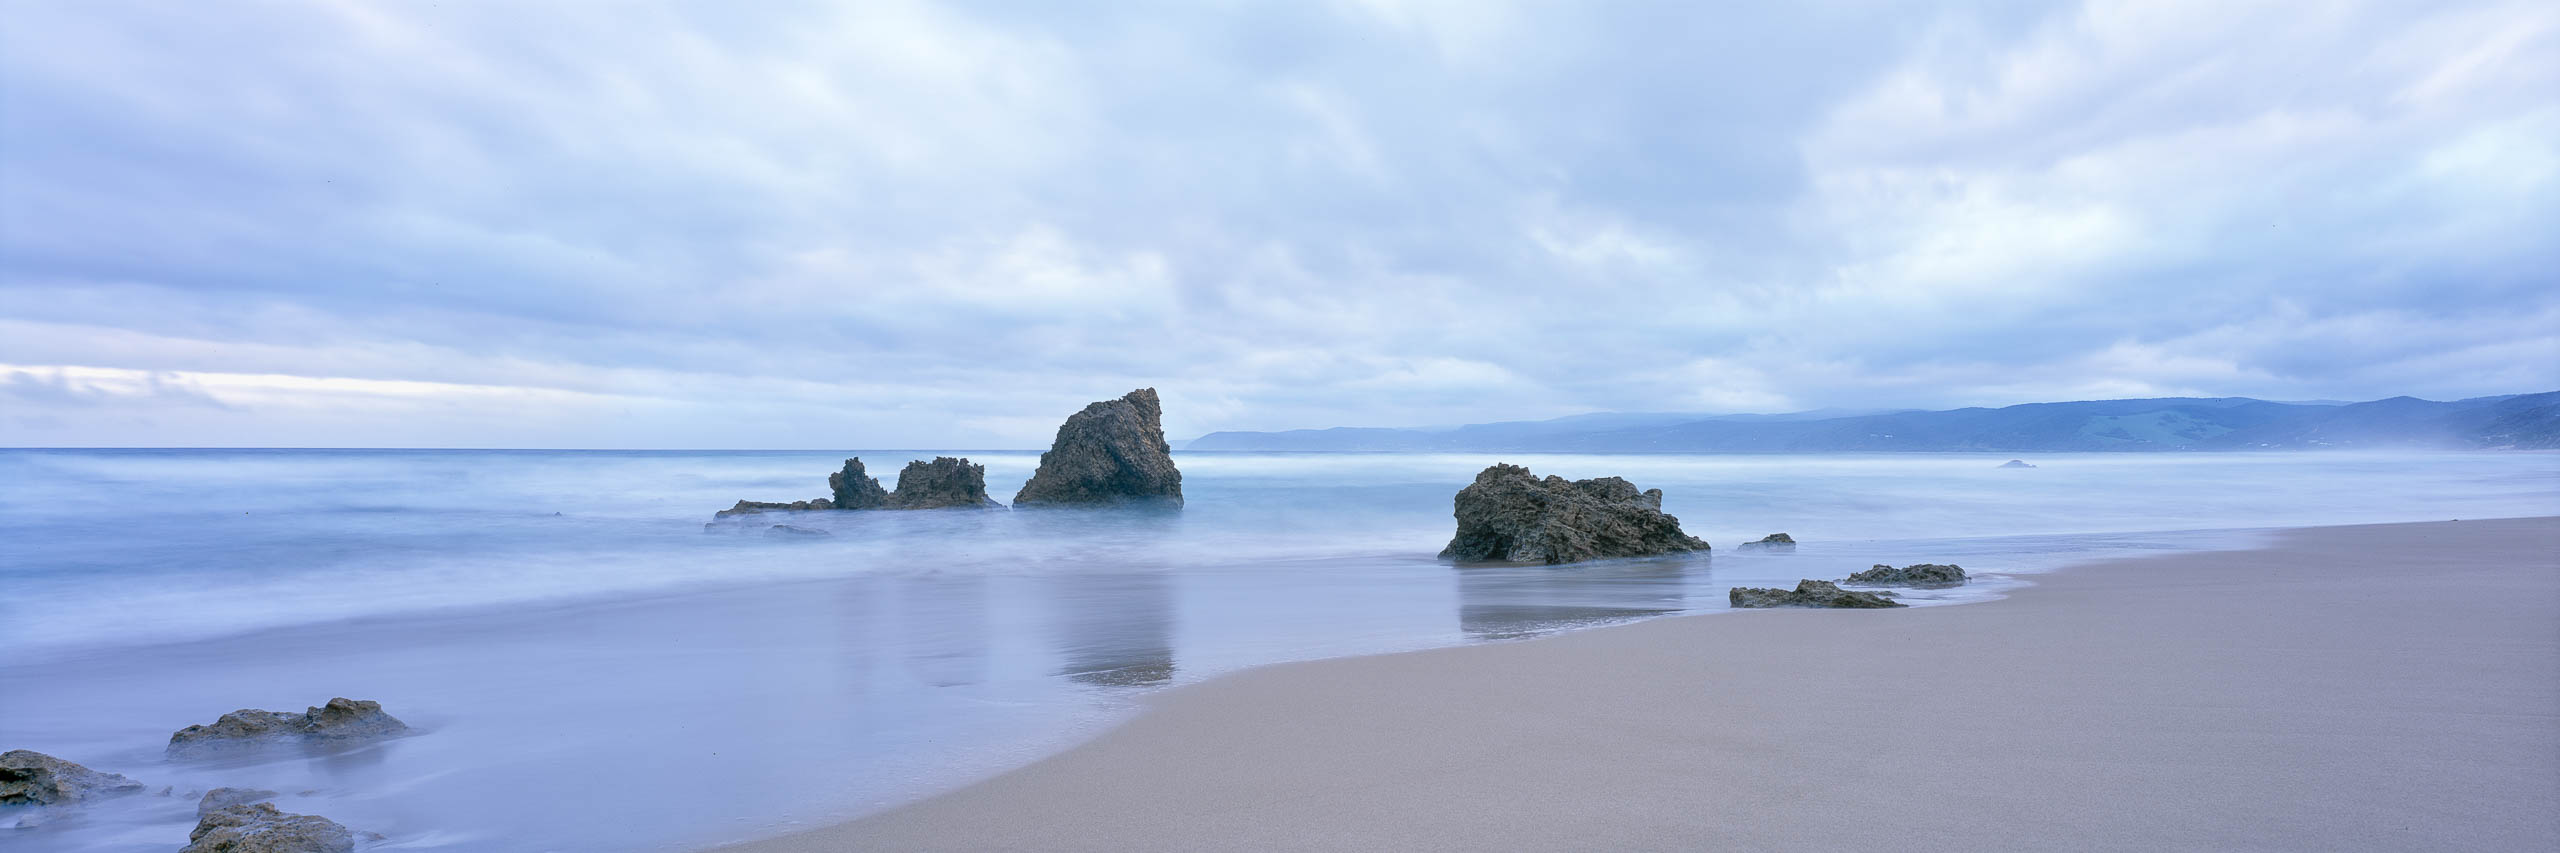 Photograph at Aireys Inlet coast